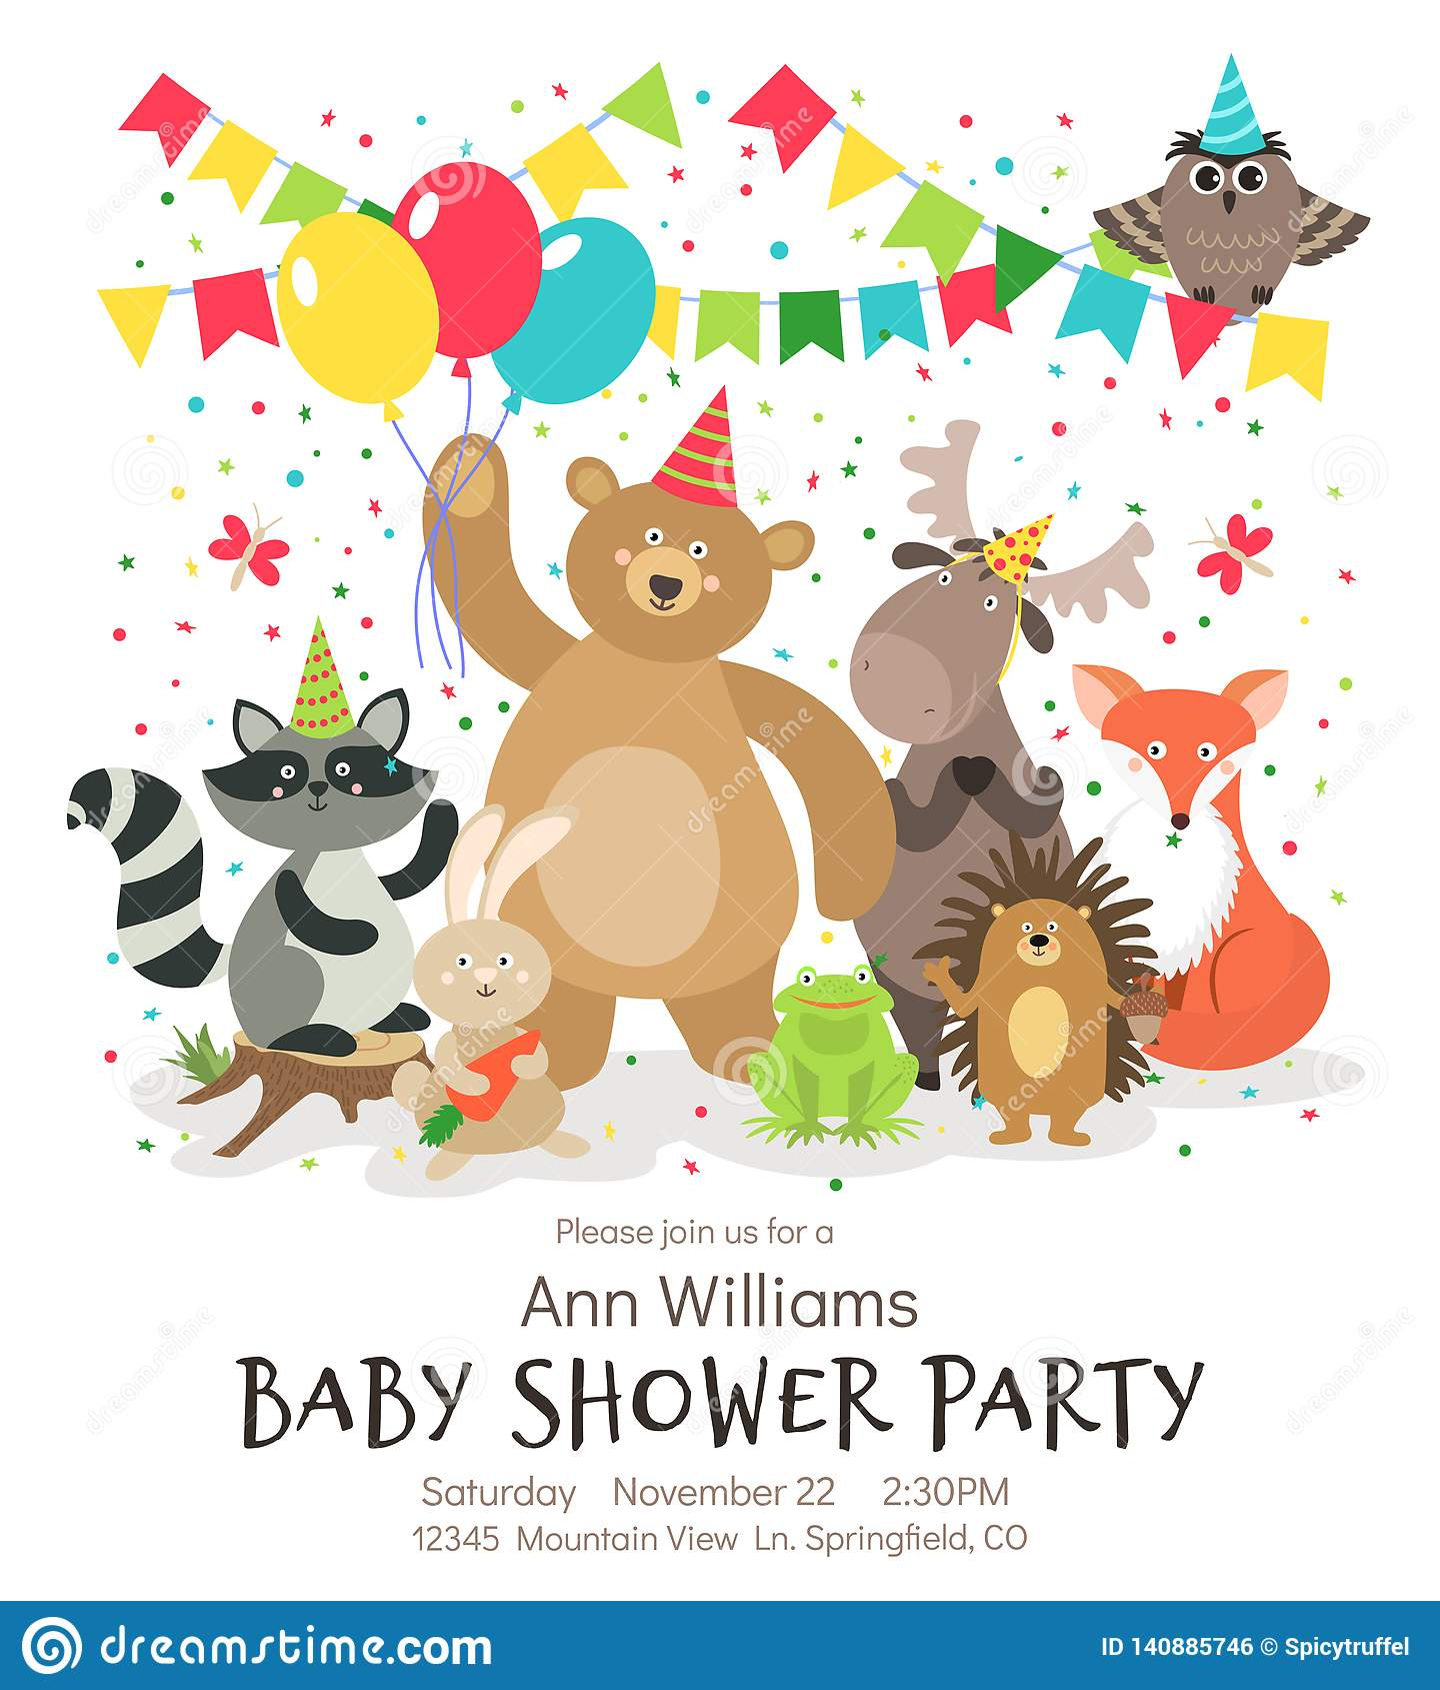 Happy Birthday Animals Poster Woodland Forest Animal Baby Shower